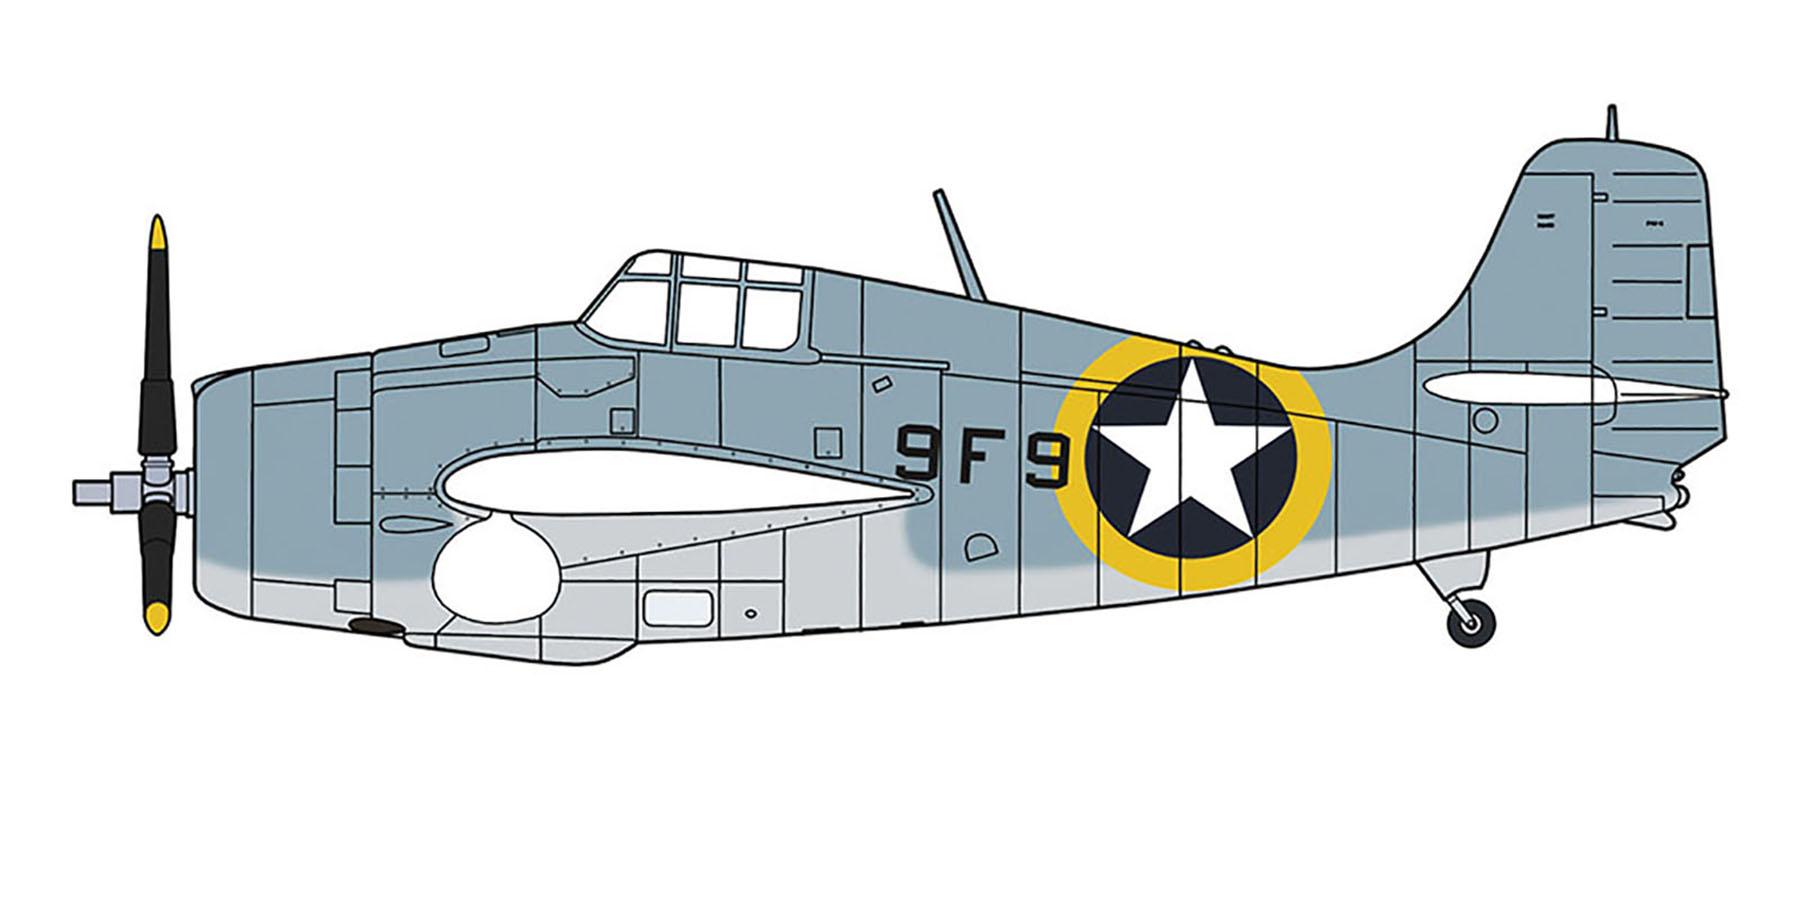 Grumman F4F 4 Wildcat VF 9 Black 9F9 aboard CV 4 USS Ranger Nov 1942 0A